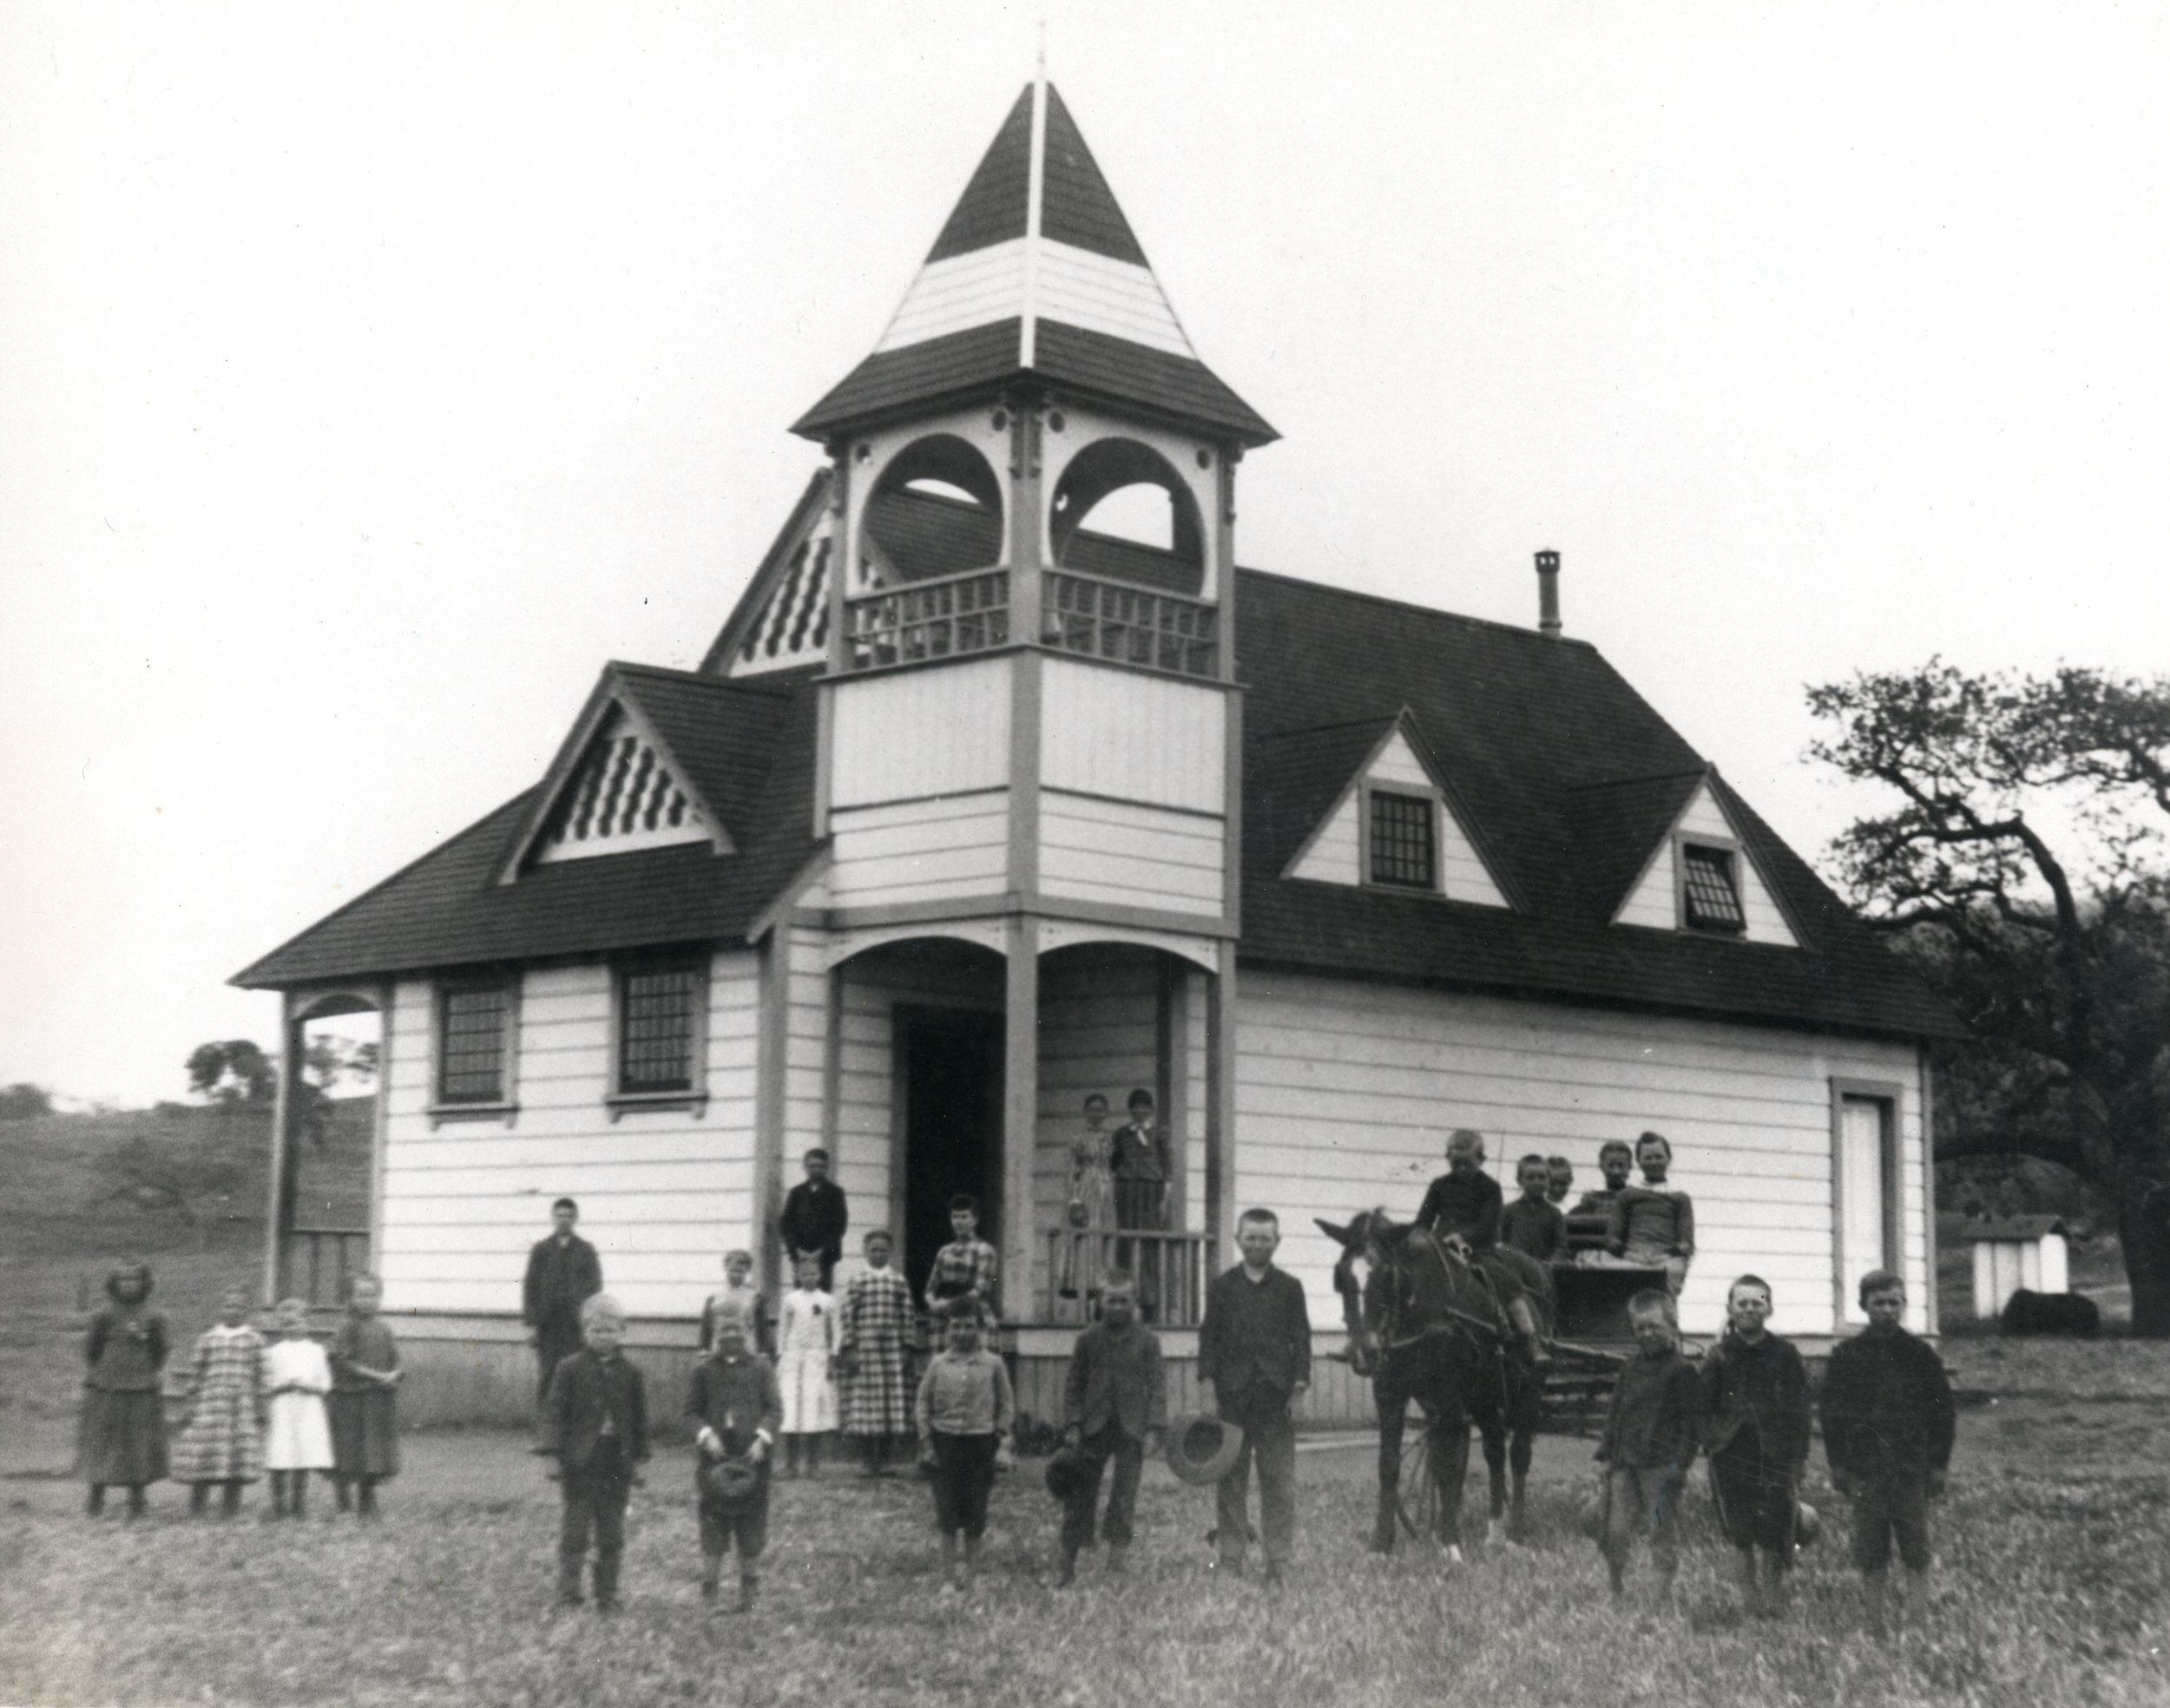 Timber School, 1890s